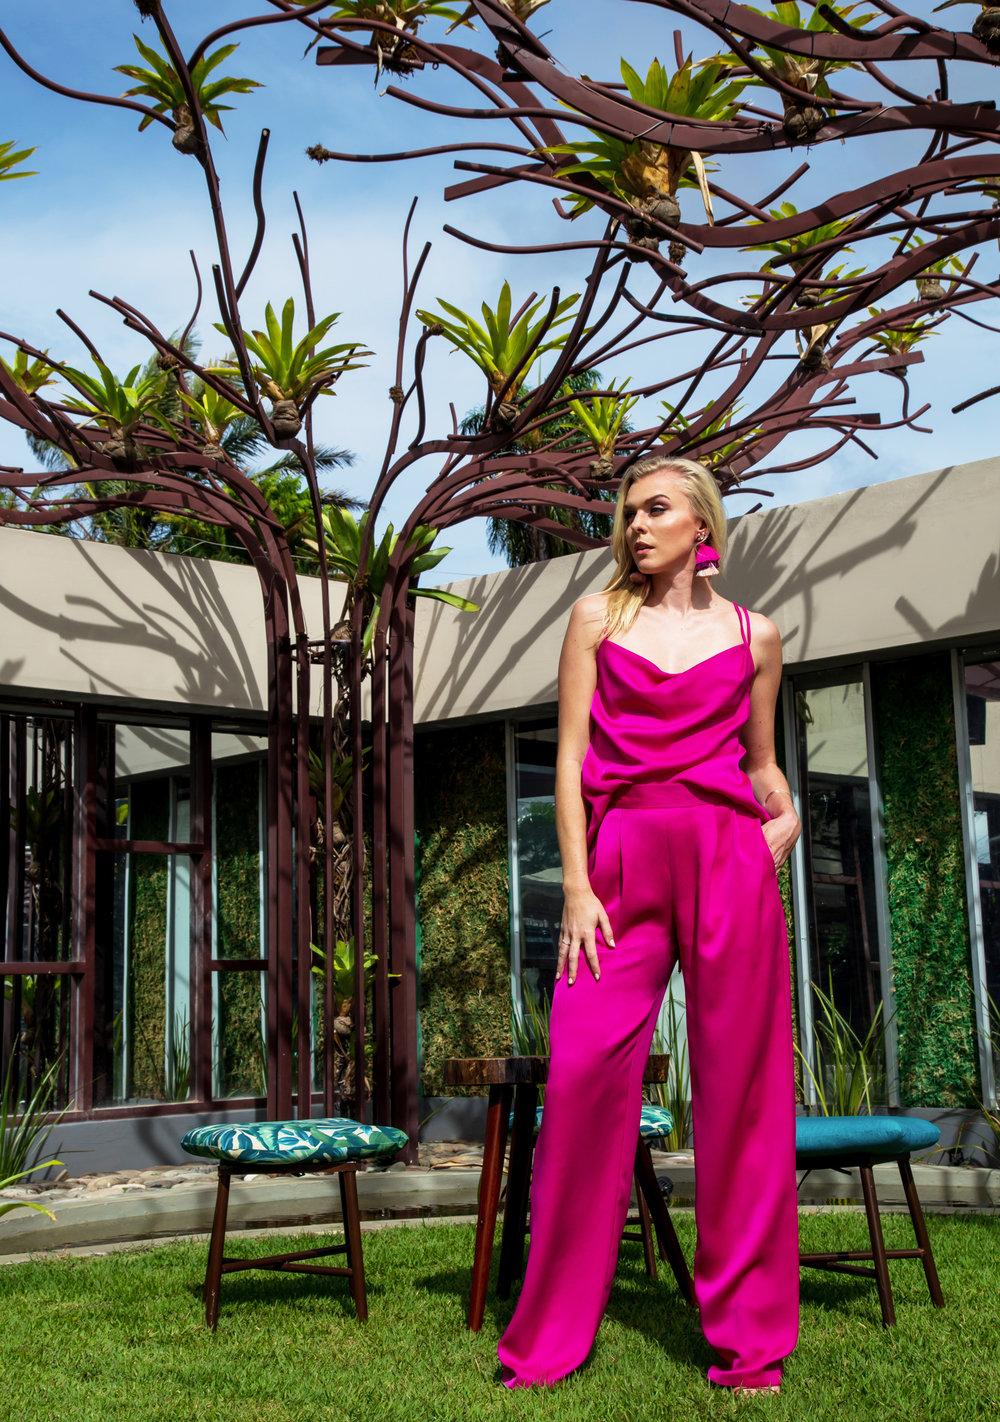 RAGNHILD_pinkoutfit.front_lighter.jpg